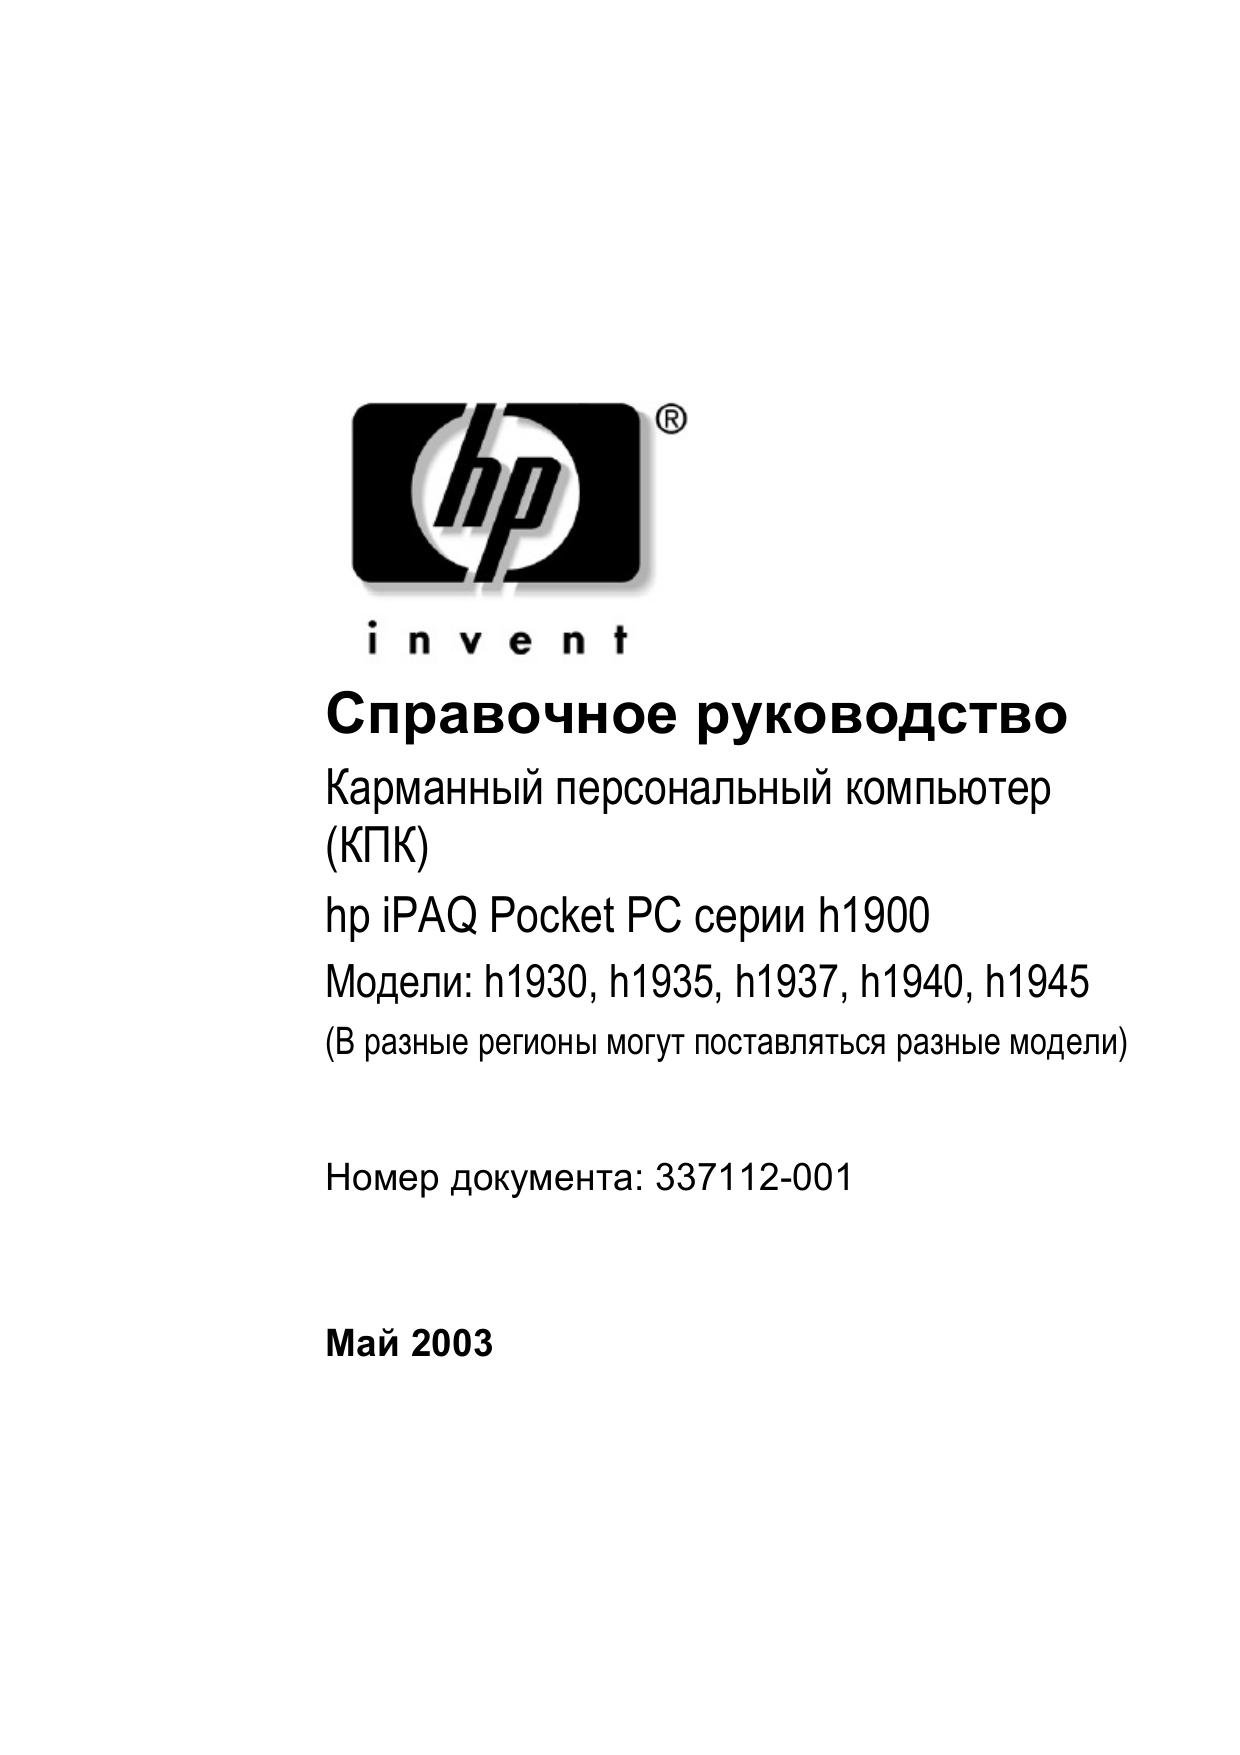 Download free pdf for hp ipaq h1940 pda manual.